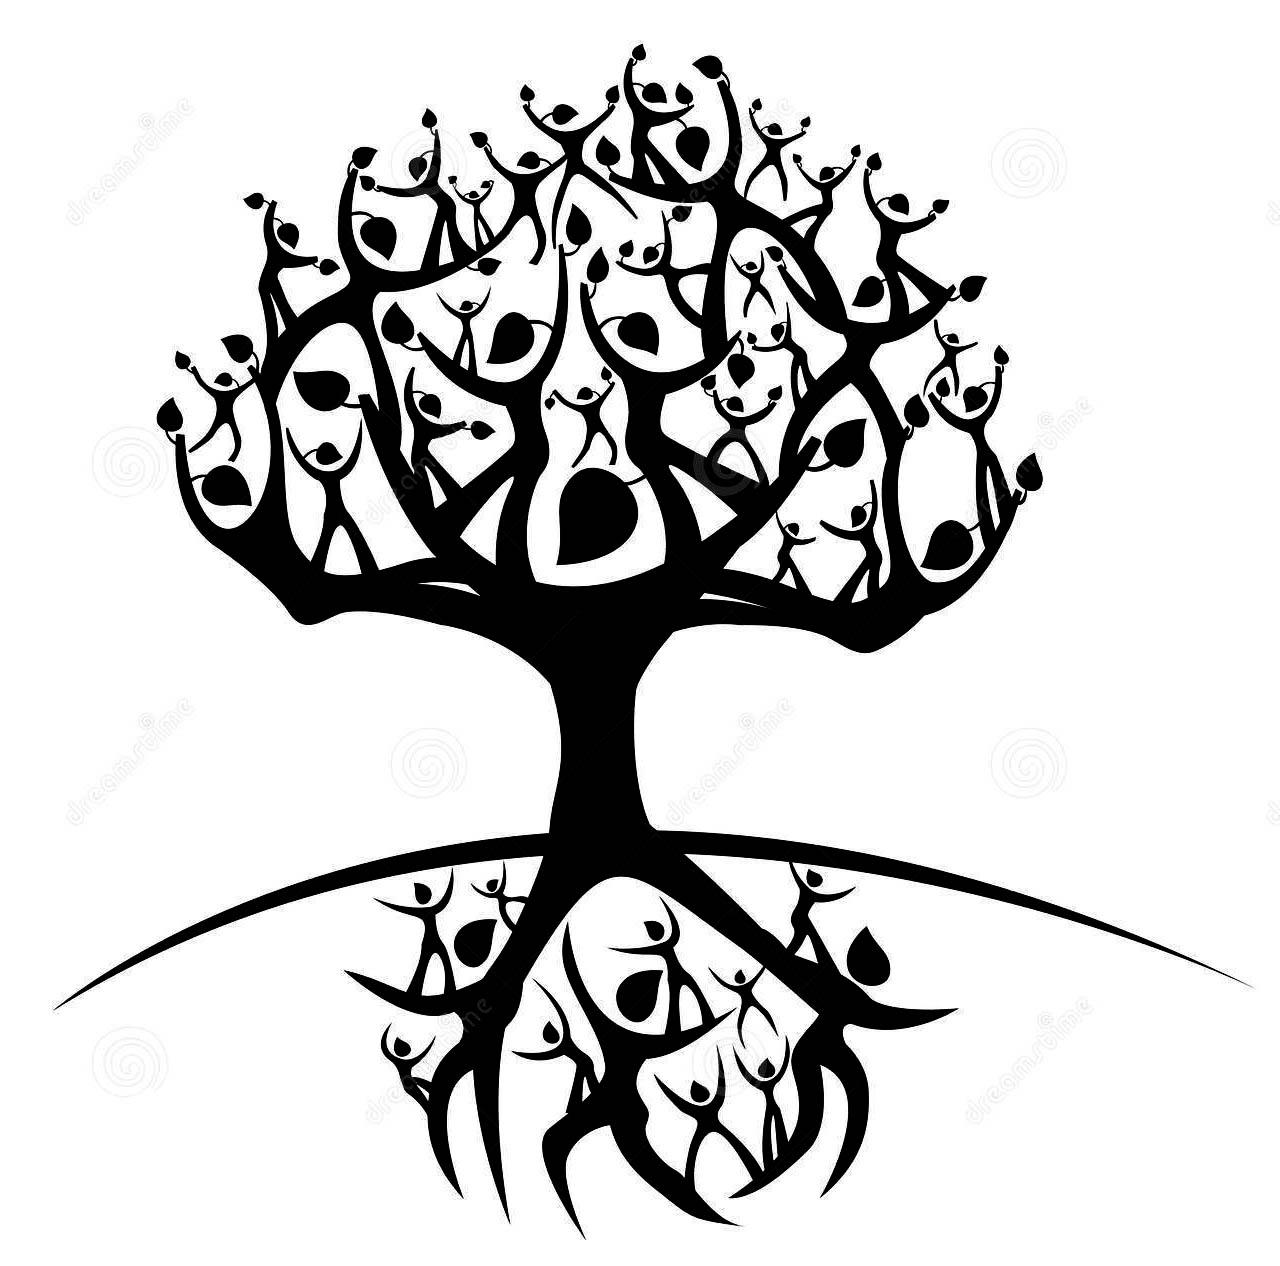 Family Tree Diagram Symbols Topsimages